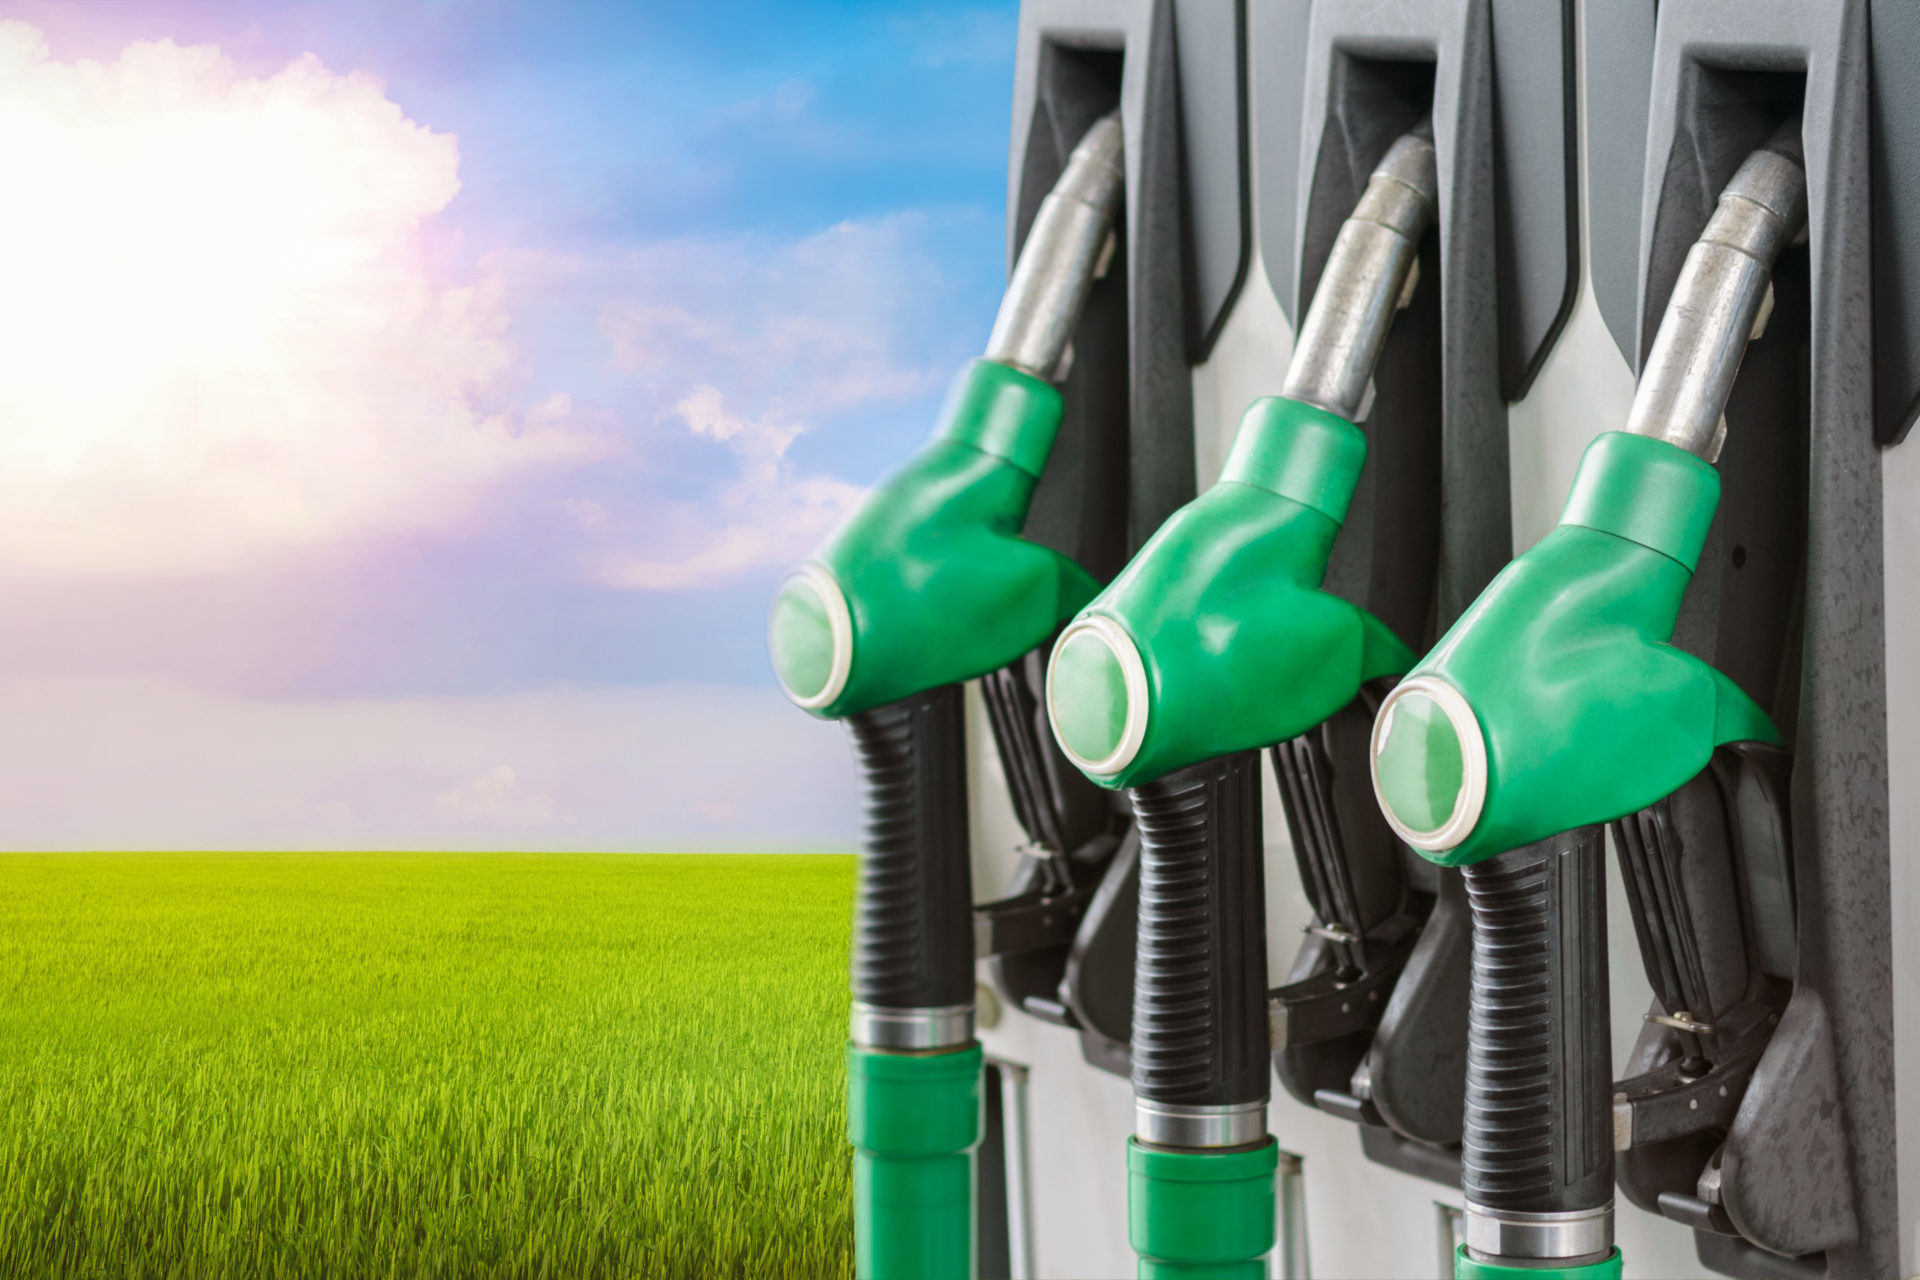 Biodiesel improves farmers' bottom line.